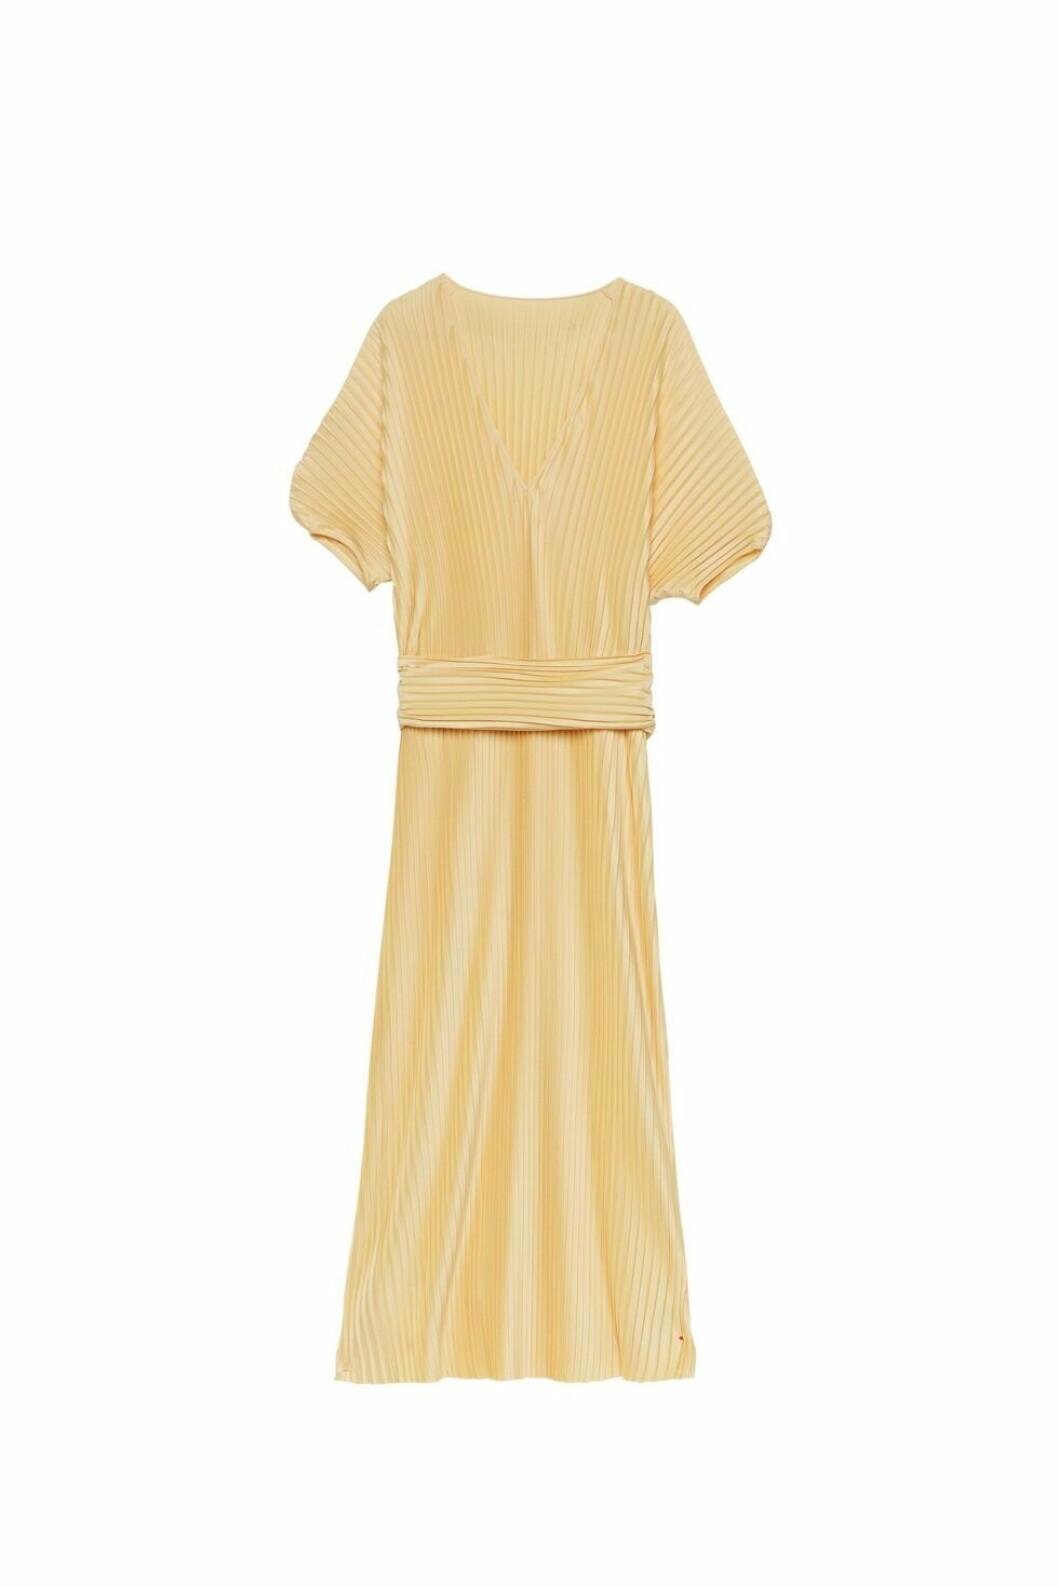 gul klänning stylein